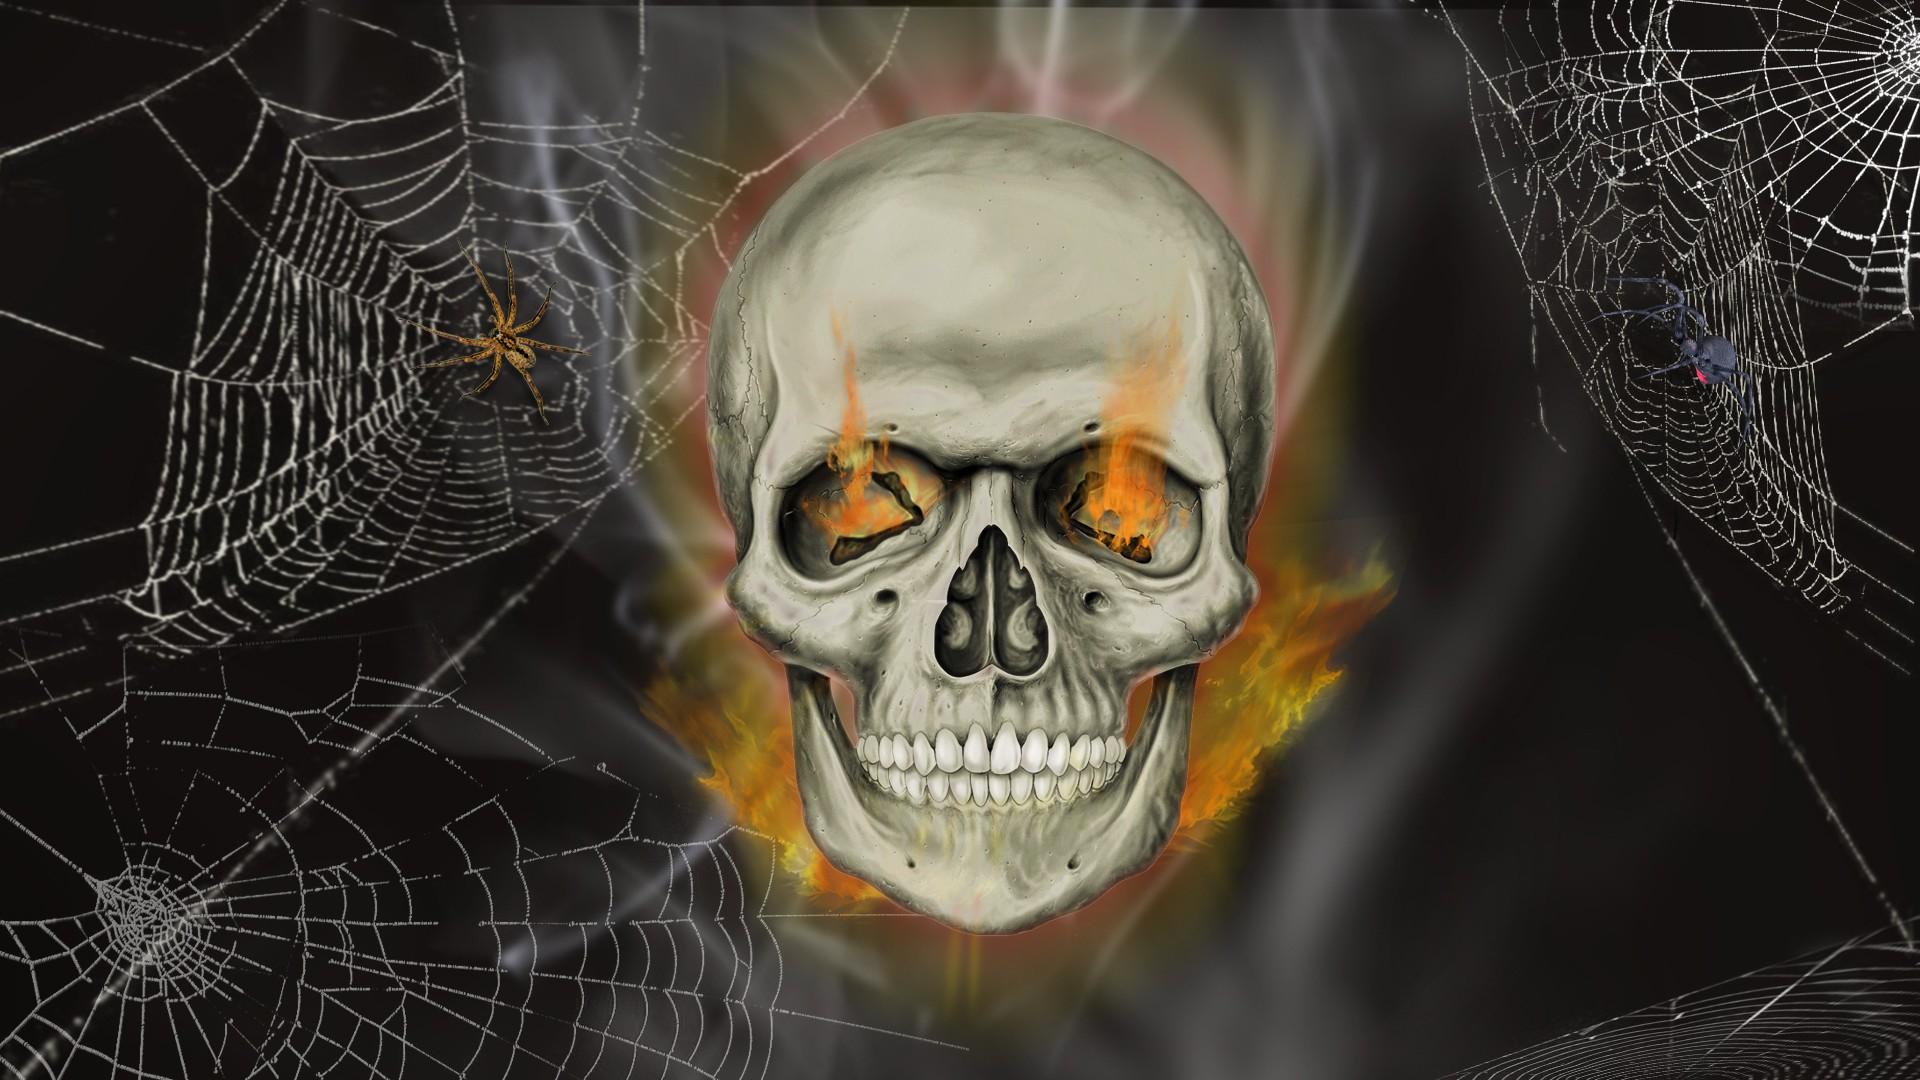 zombie skull wallpapers for desktop - photo #18